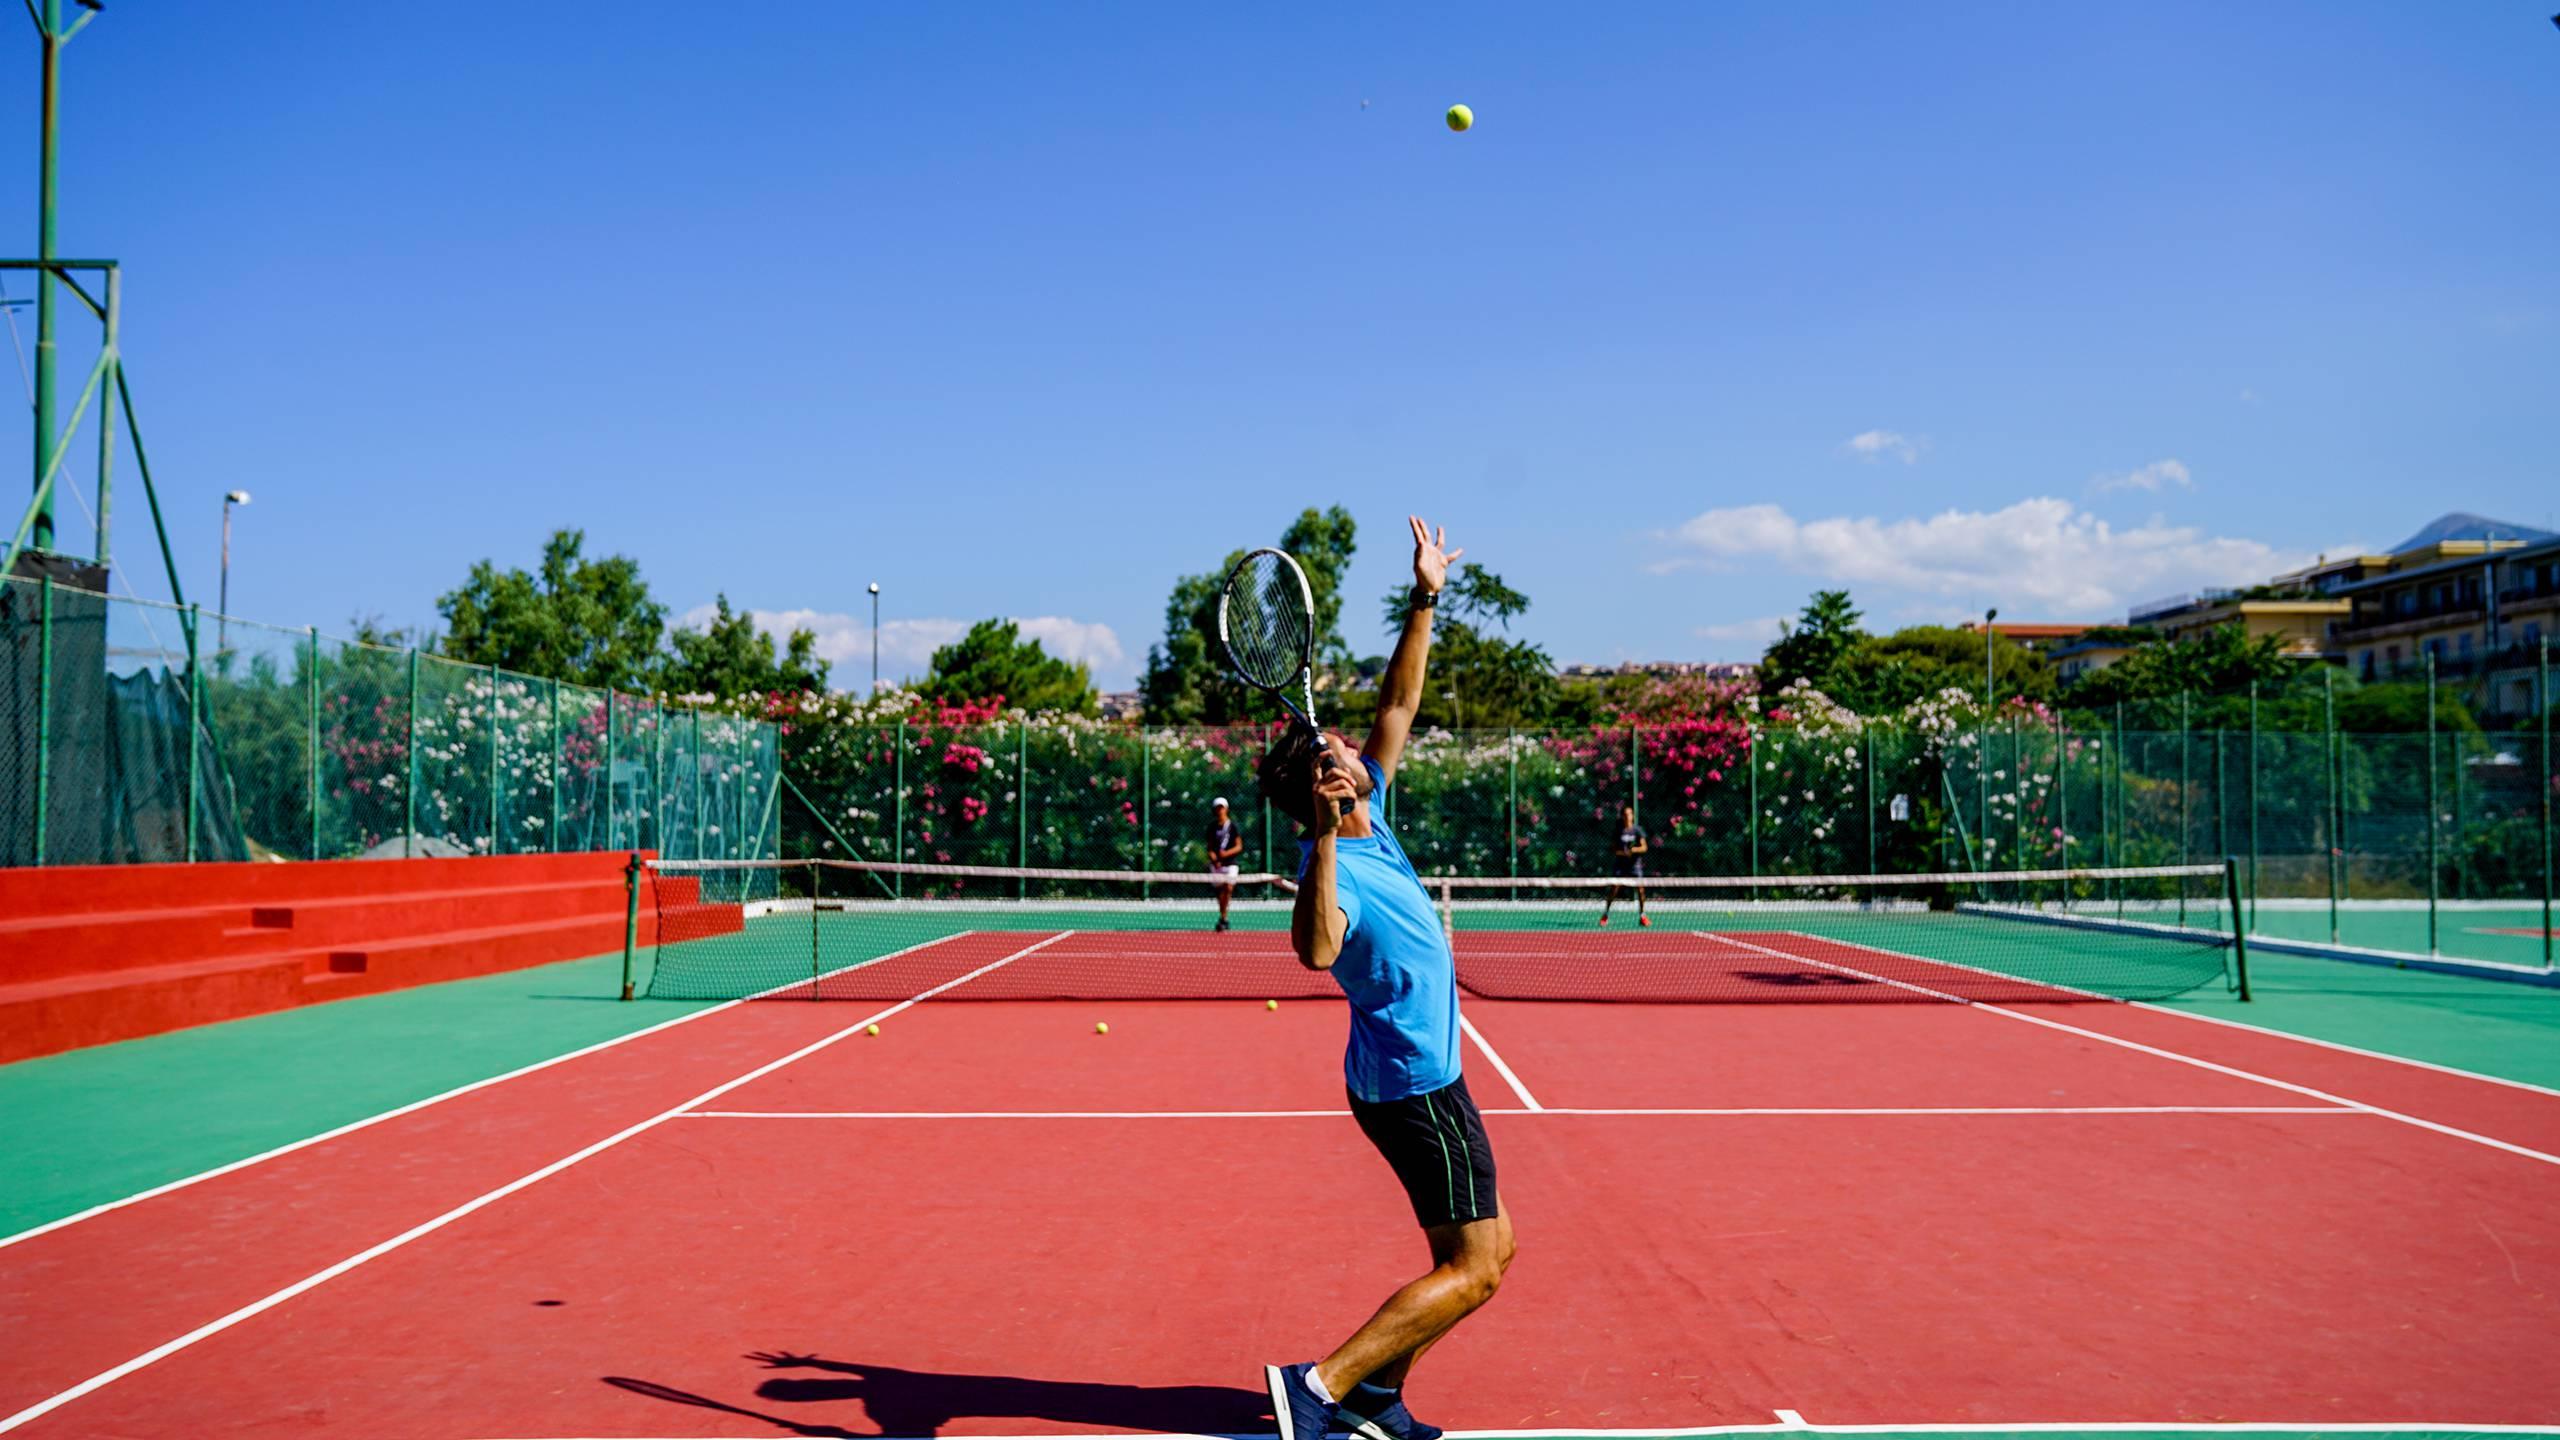 Santa-Caterina-Village-Scalea-анимация-тренировка-теннис-2-DSC00846